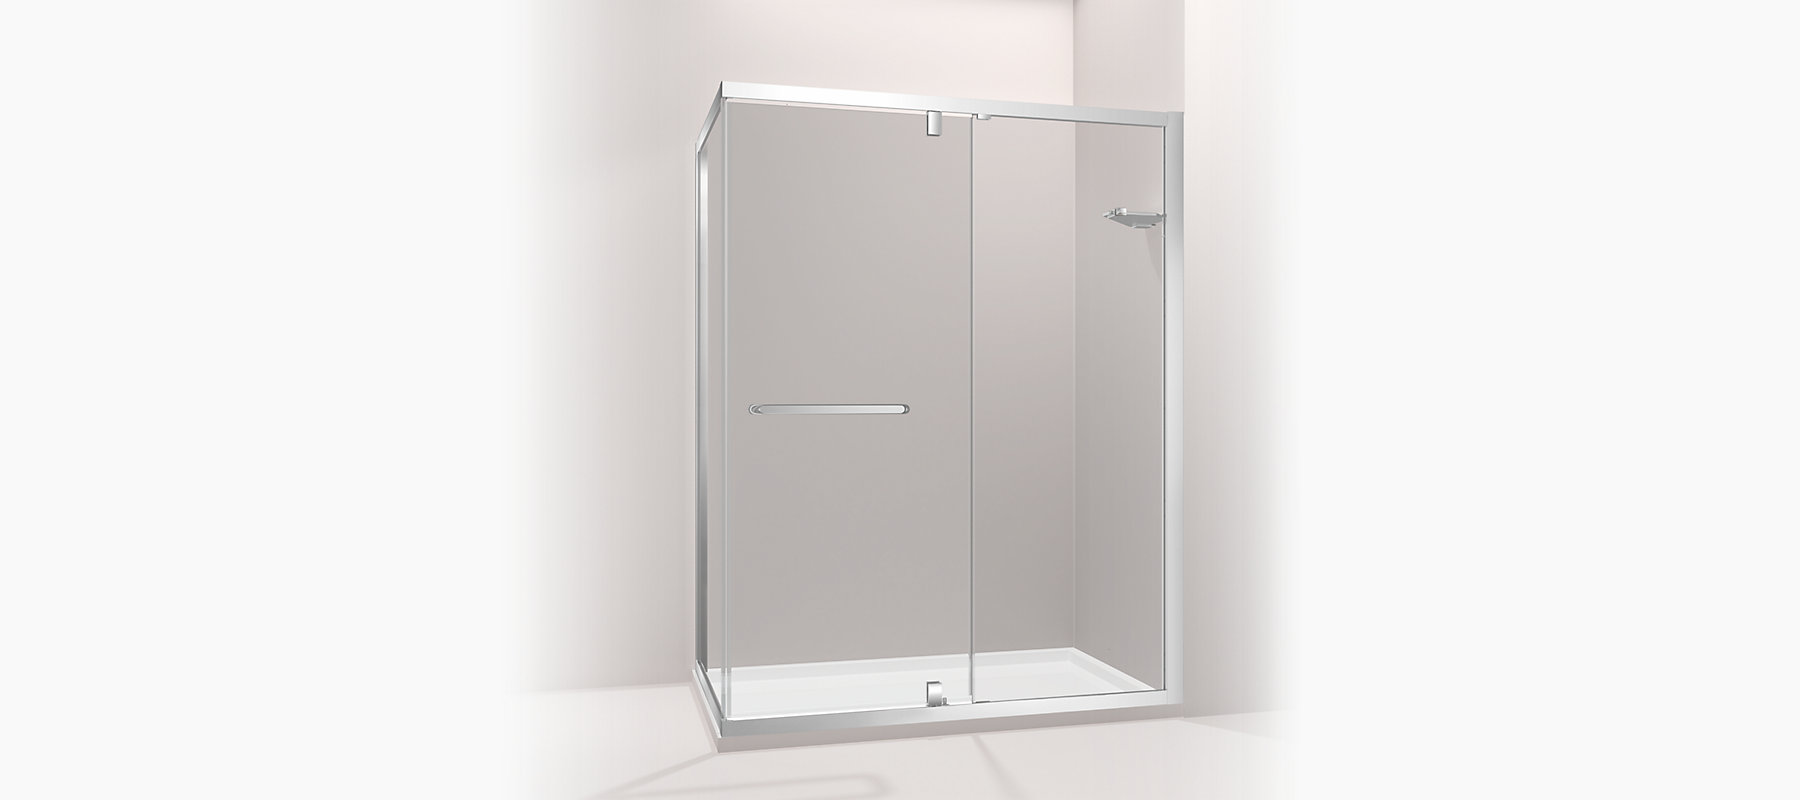 KOHLER APAC - Luxury Bathrooms and Designer Kitchens